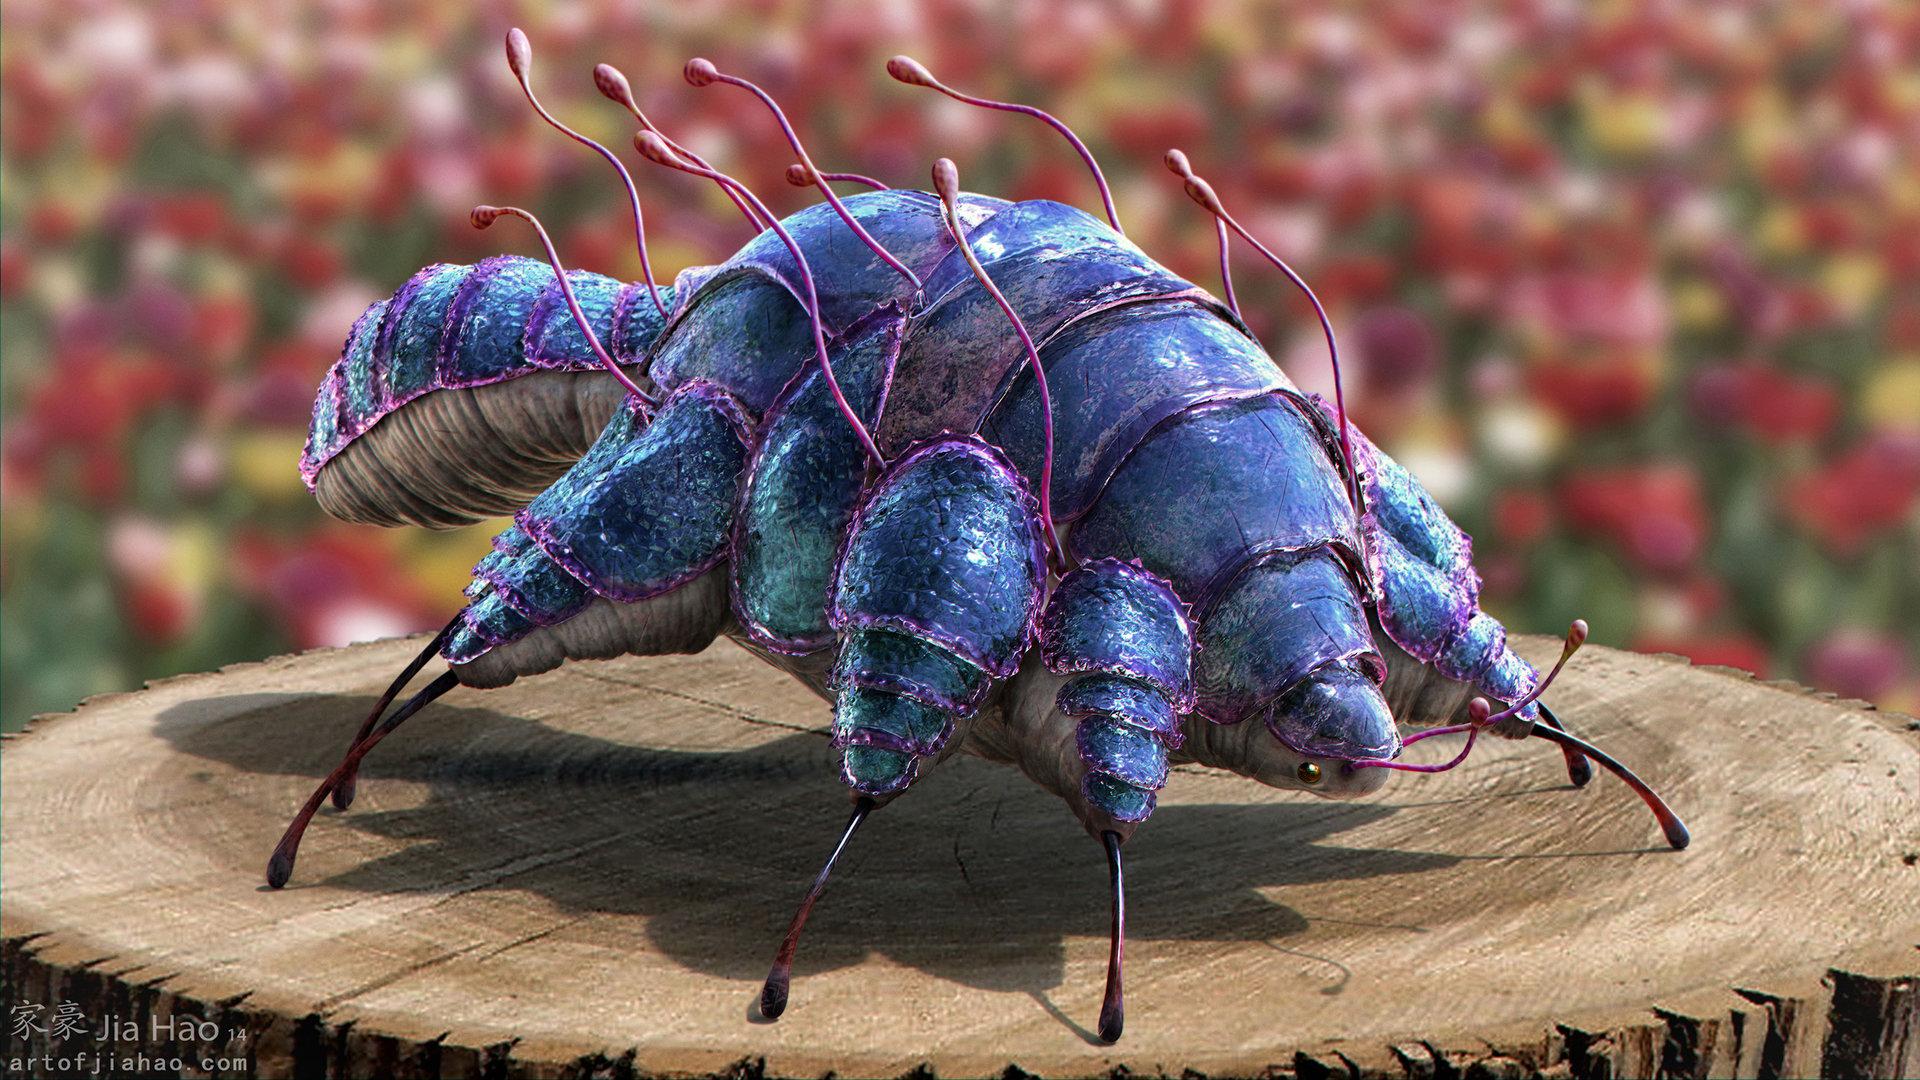 Jia hao 2014 08 armor bug comp